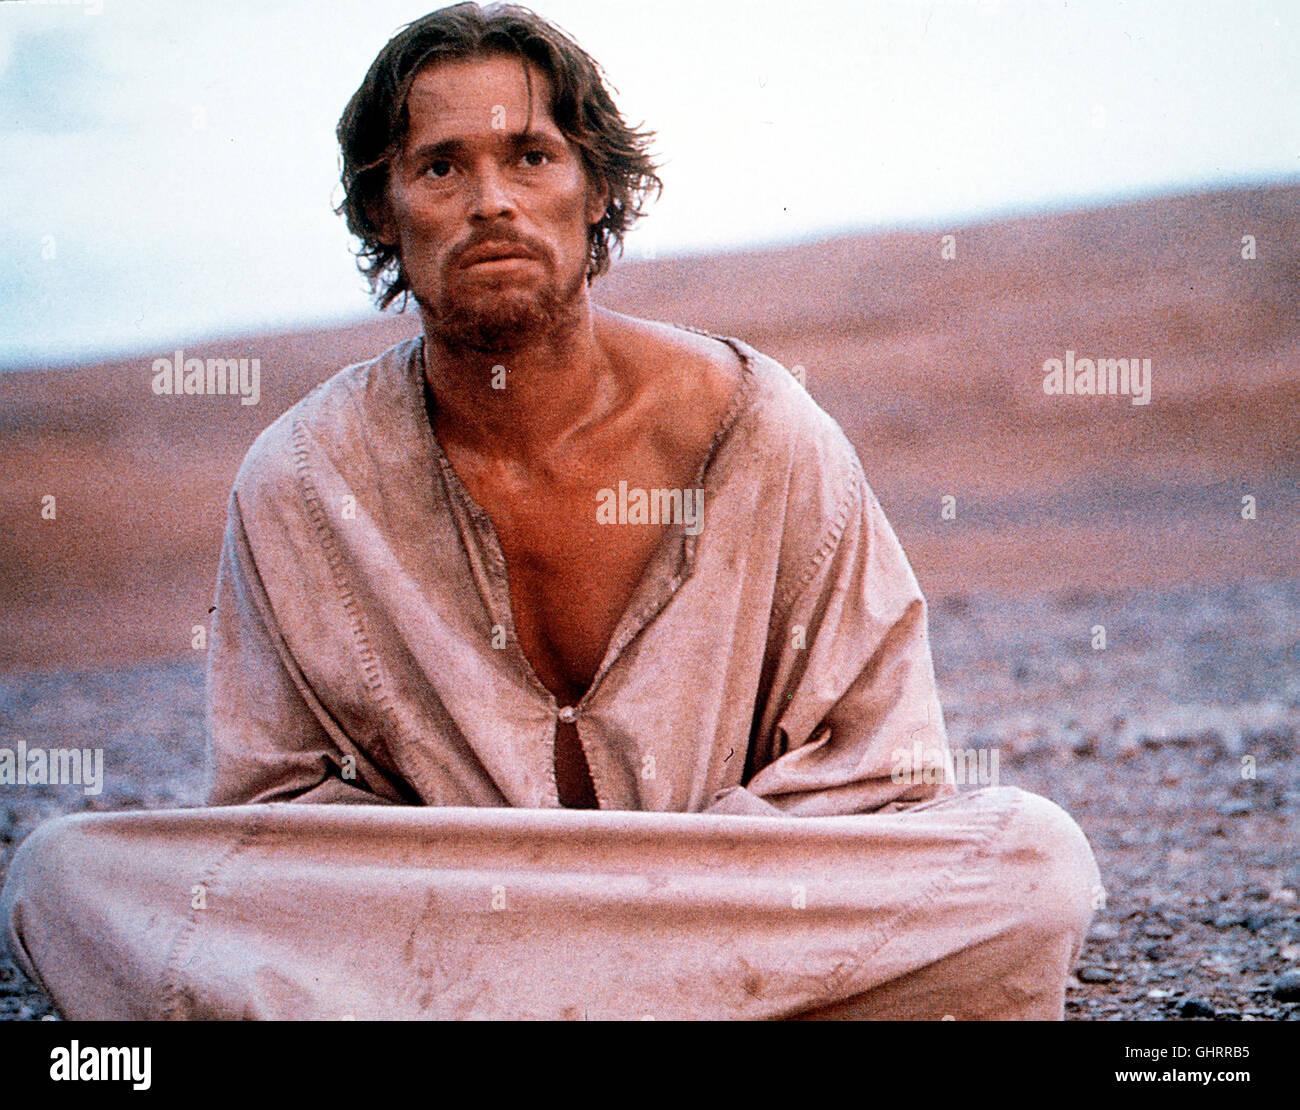 The Last Temptation Of Christ Stock Photos & The Last Temptation Of ...